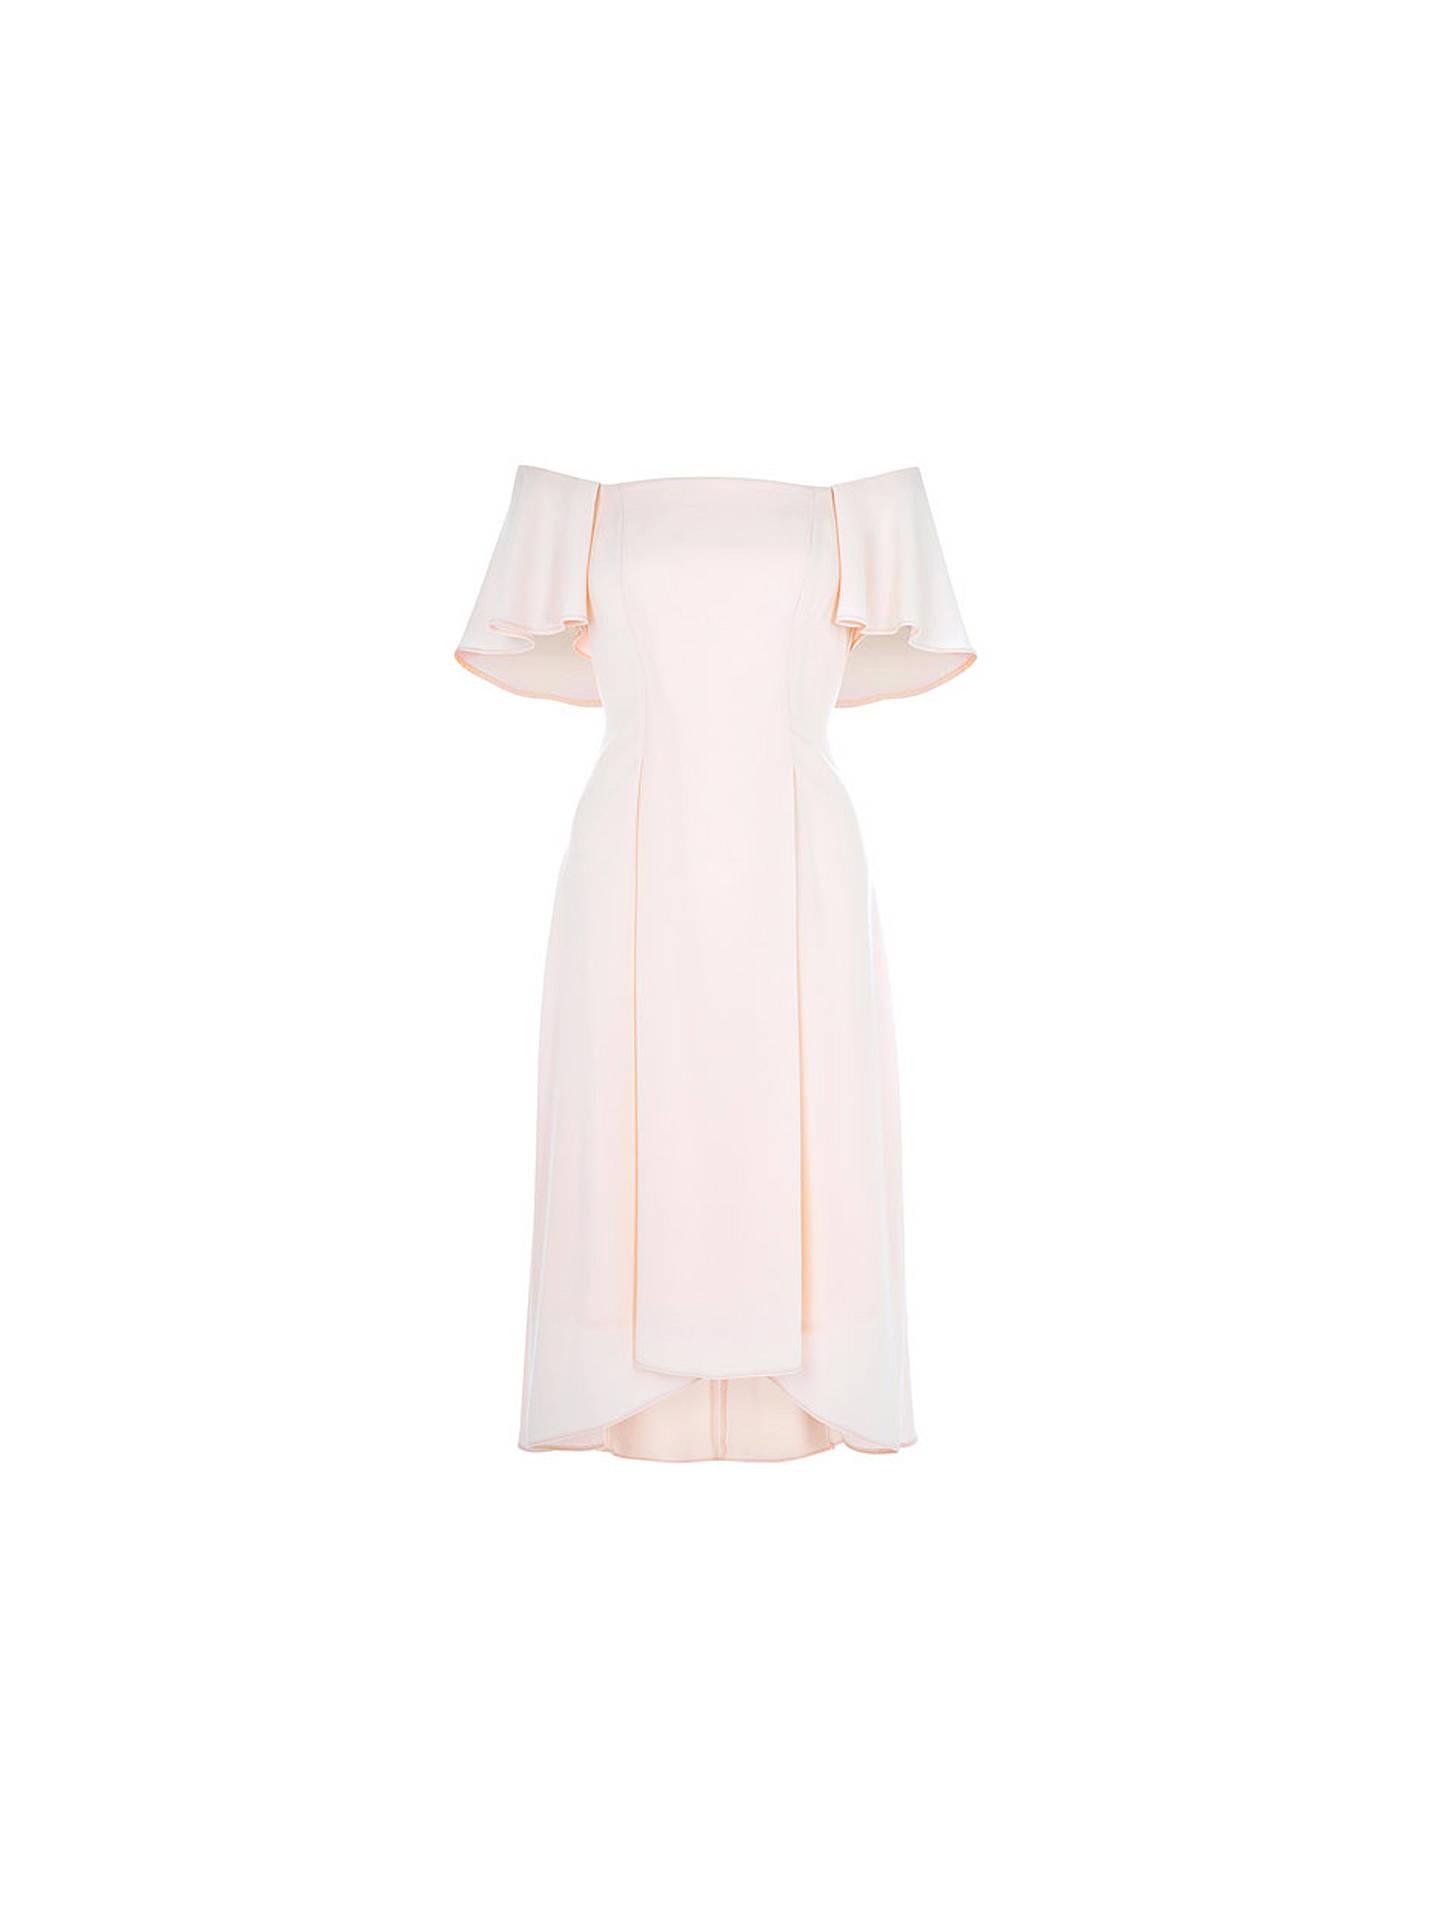 94431b32ff70 ... Buy Coast Betty Midi Dress, Blush, 6 Online at johnlewis.com